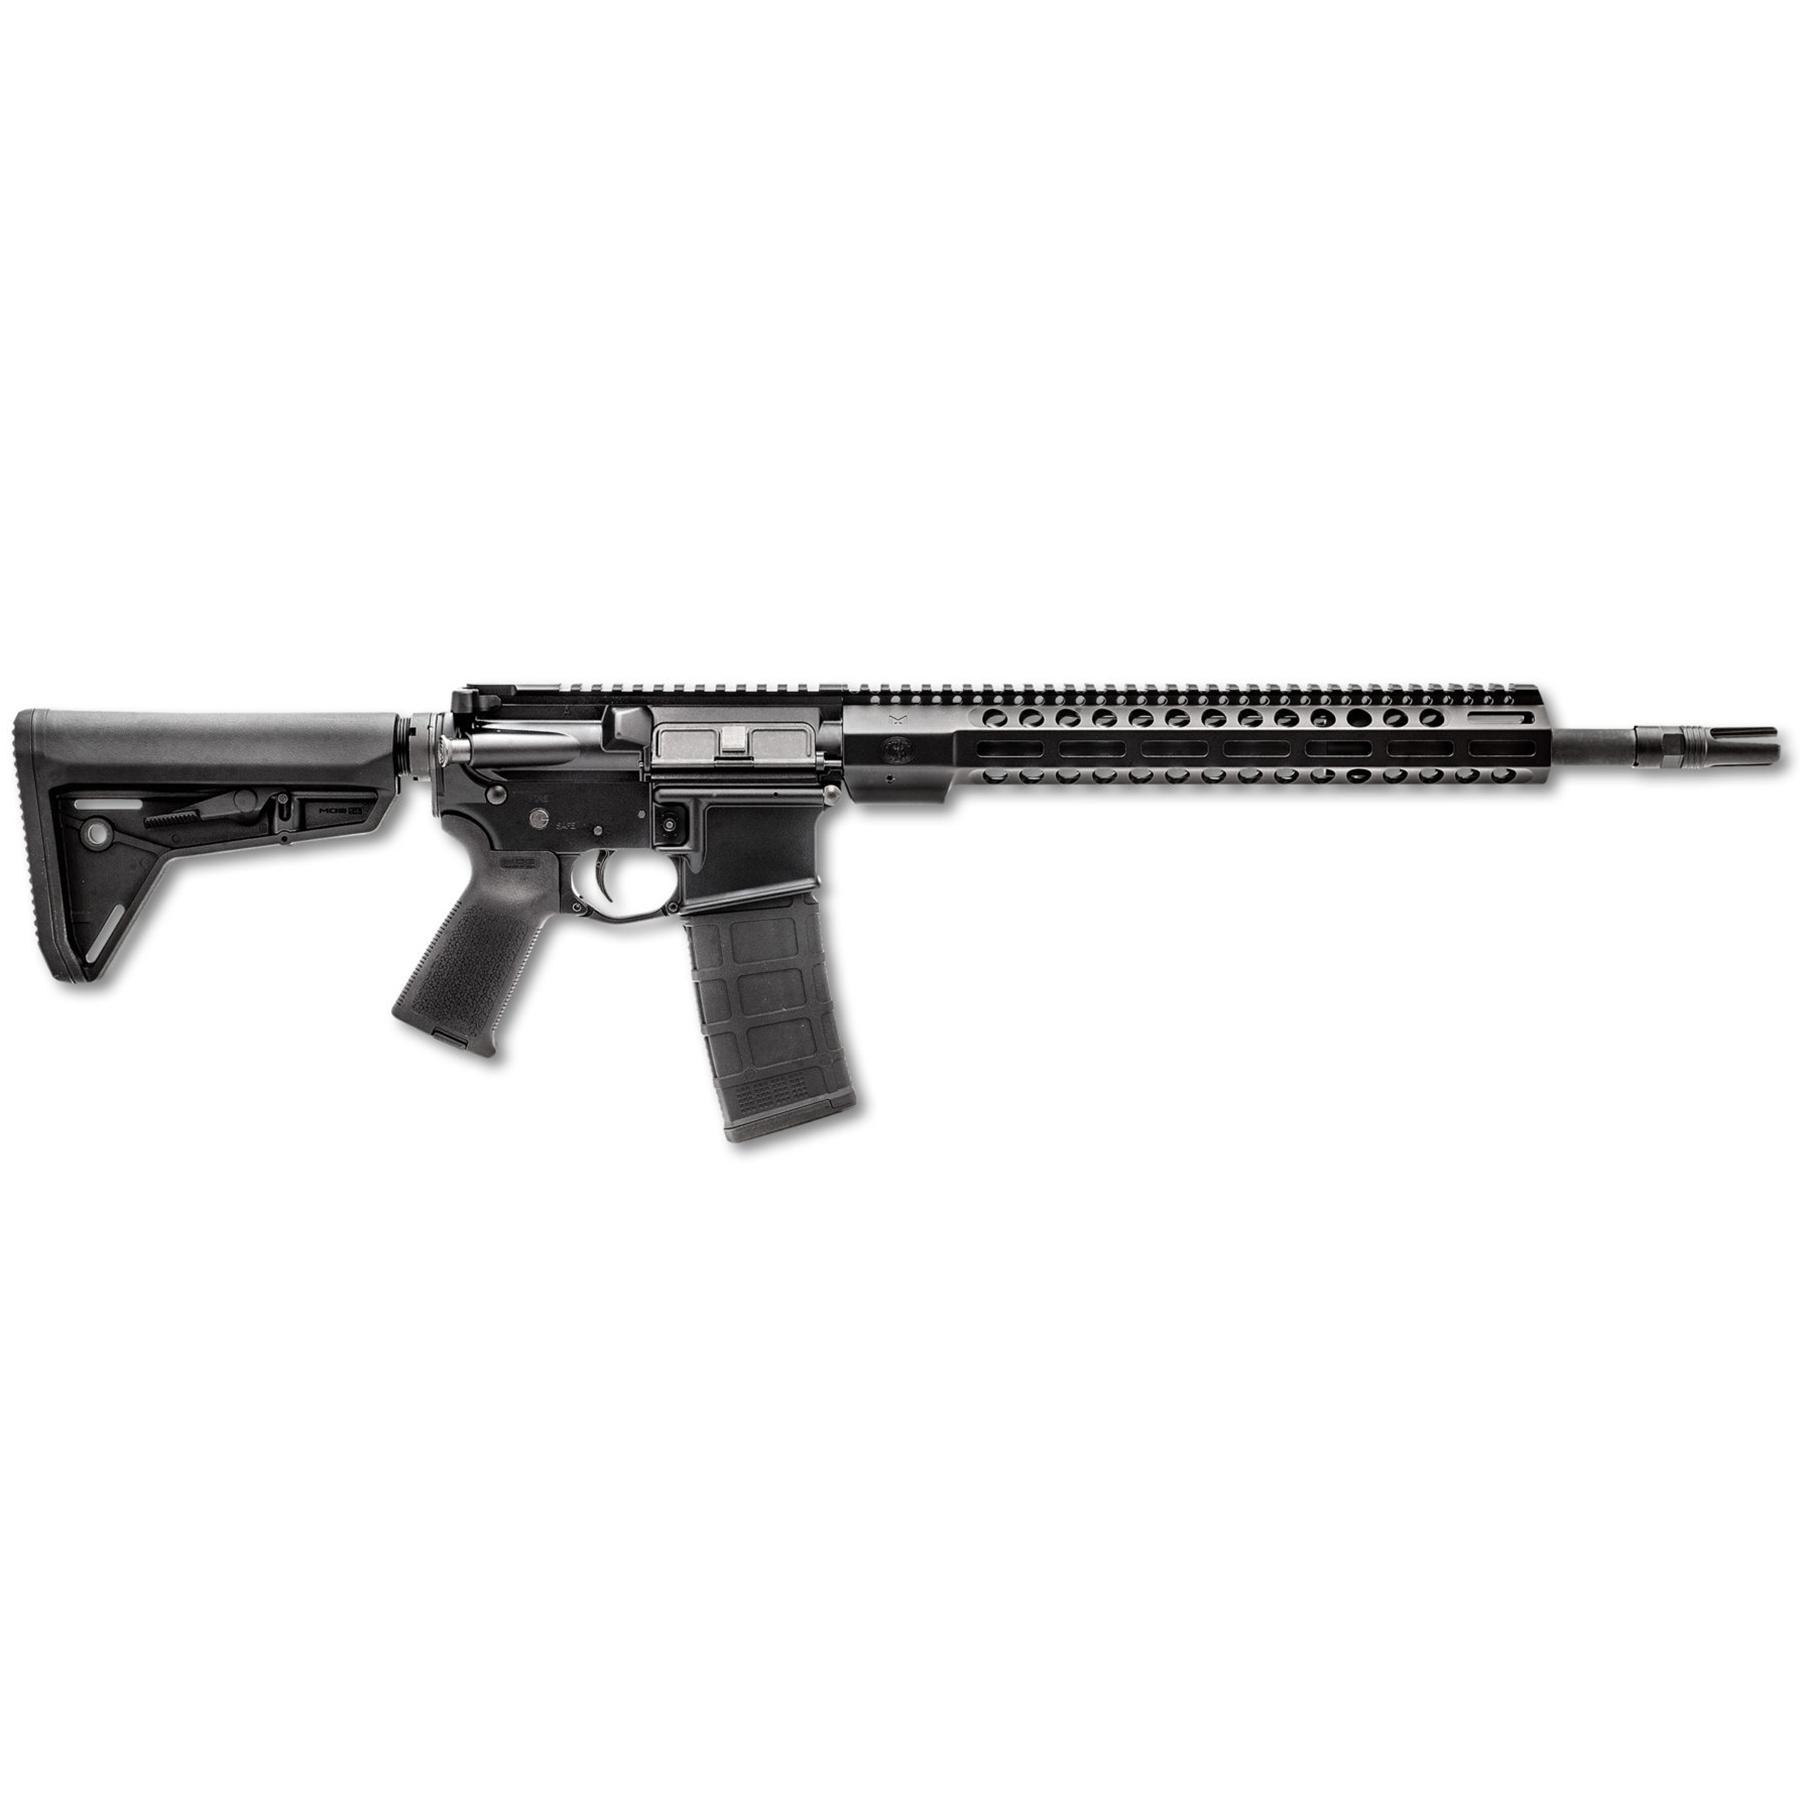 FN 15 Tactical II Centerfire Rifle